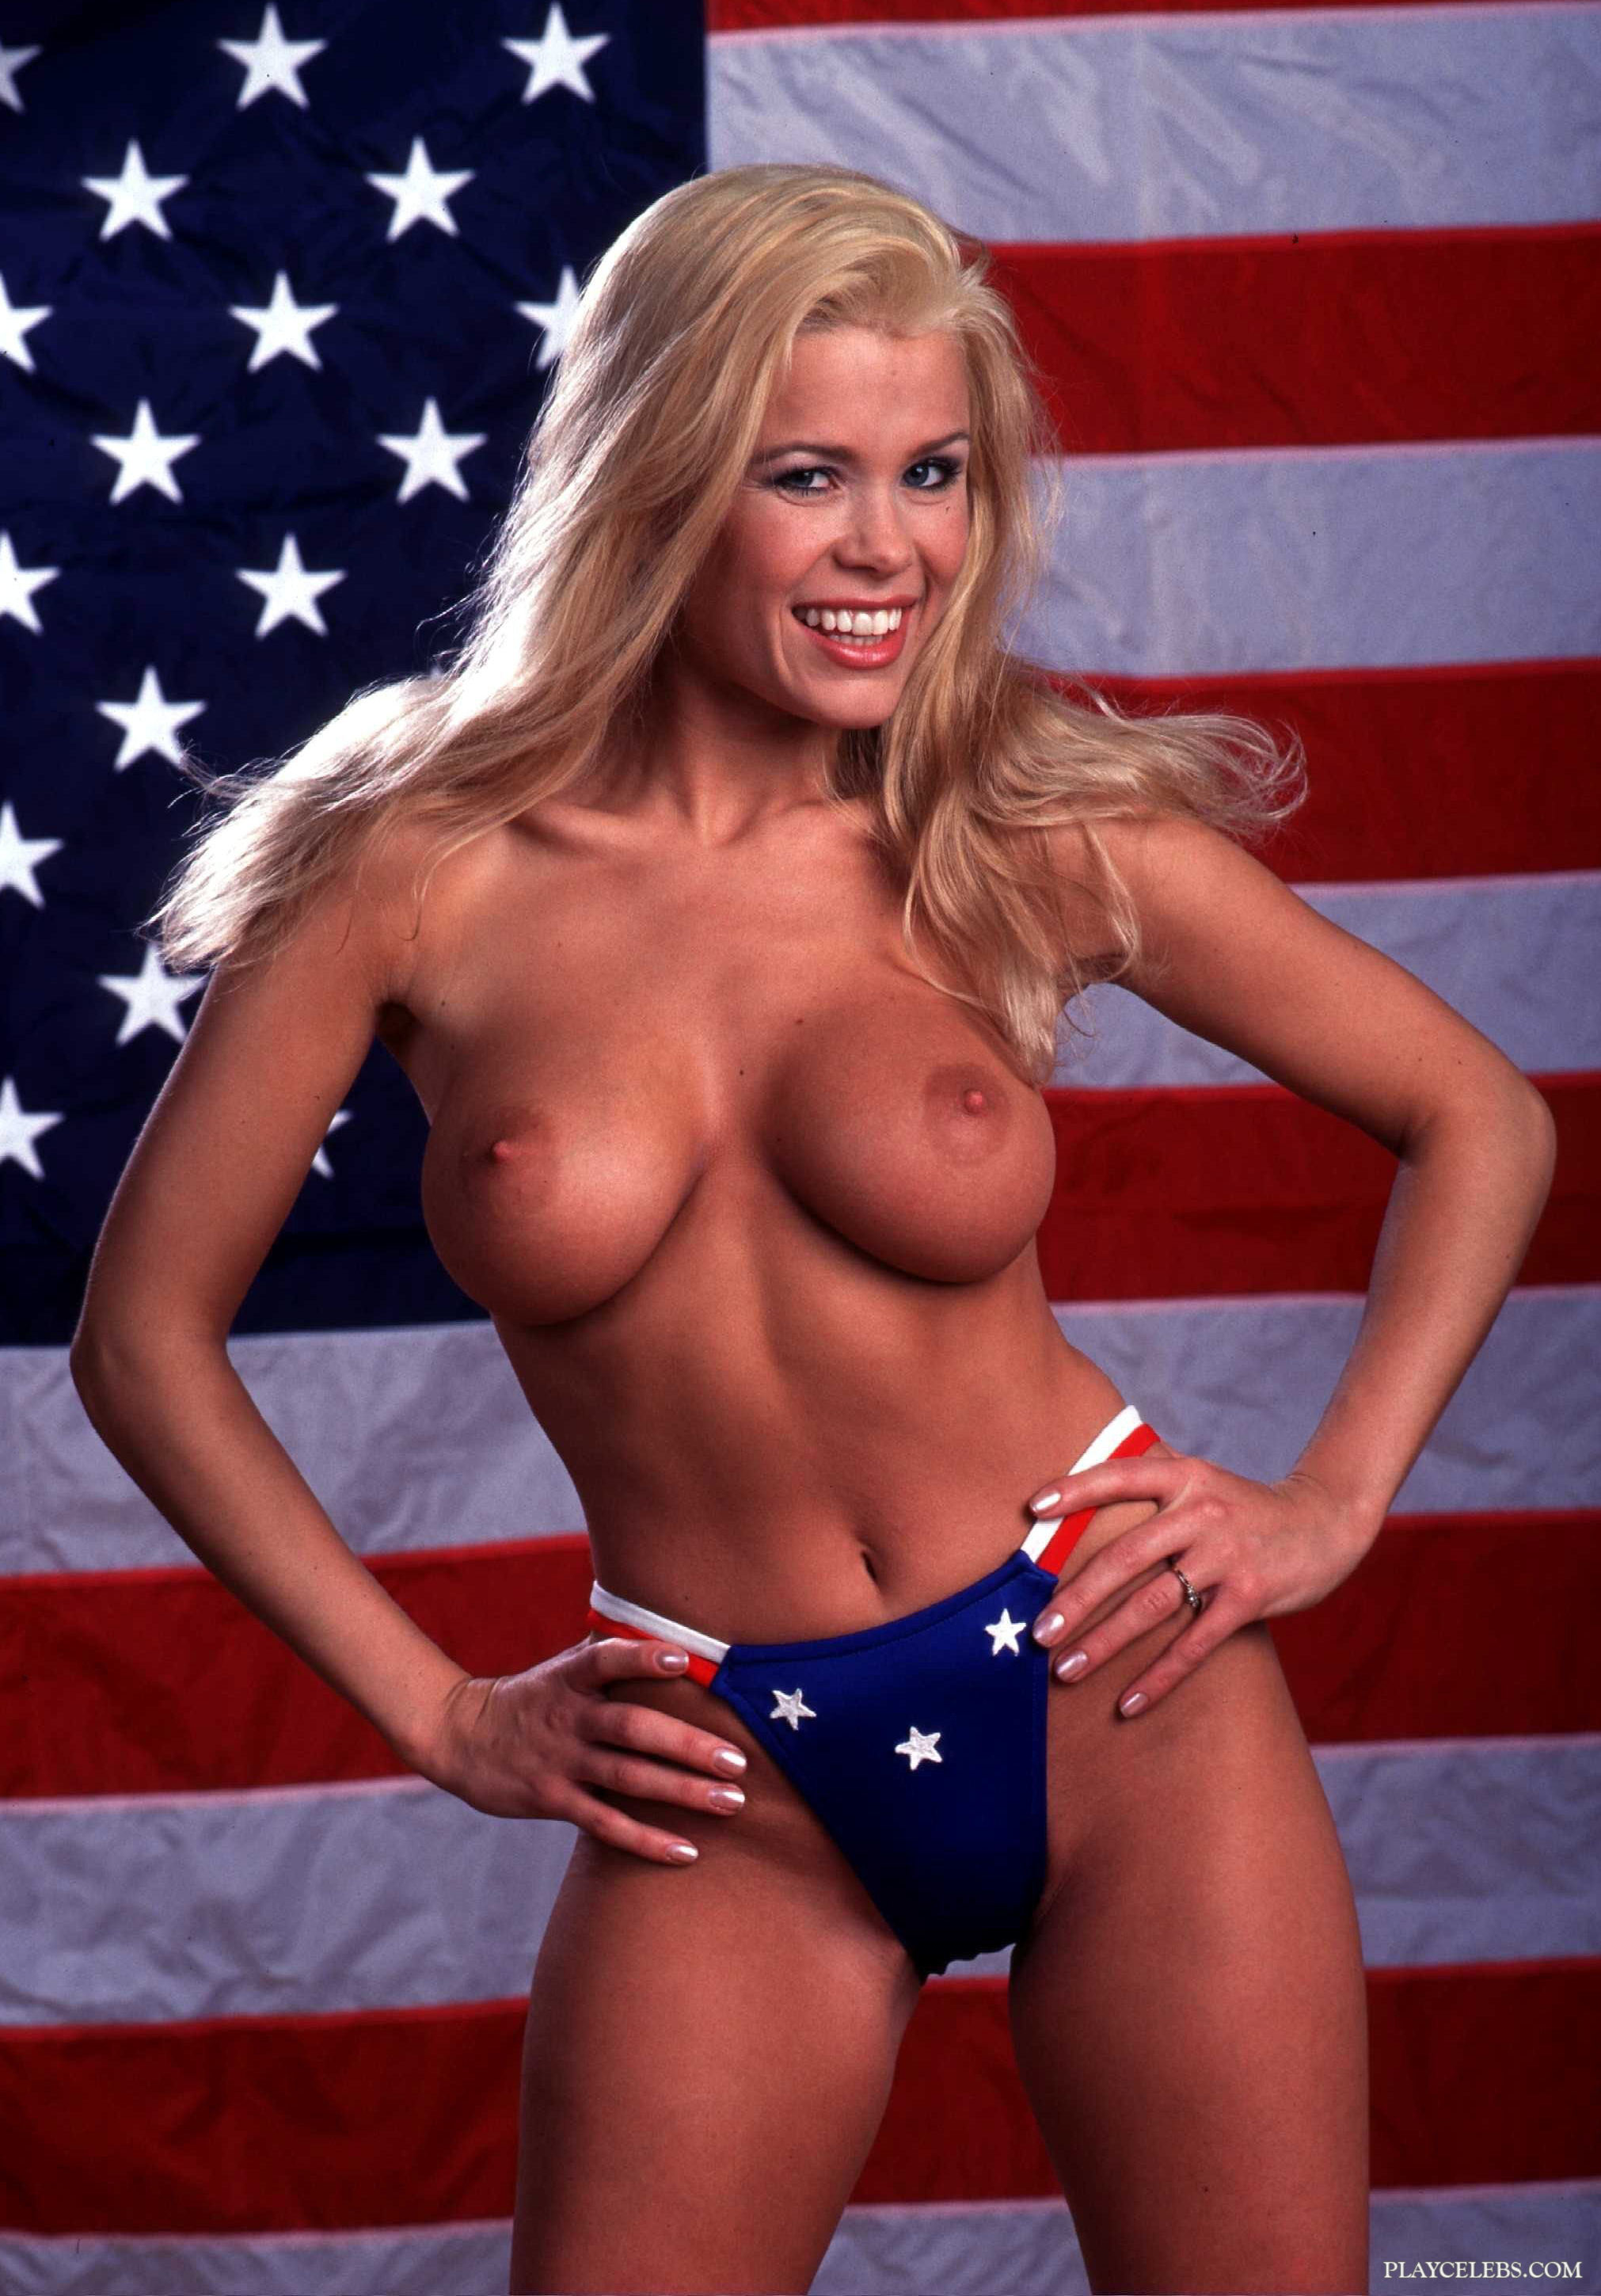 Melinda messenger nude